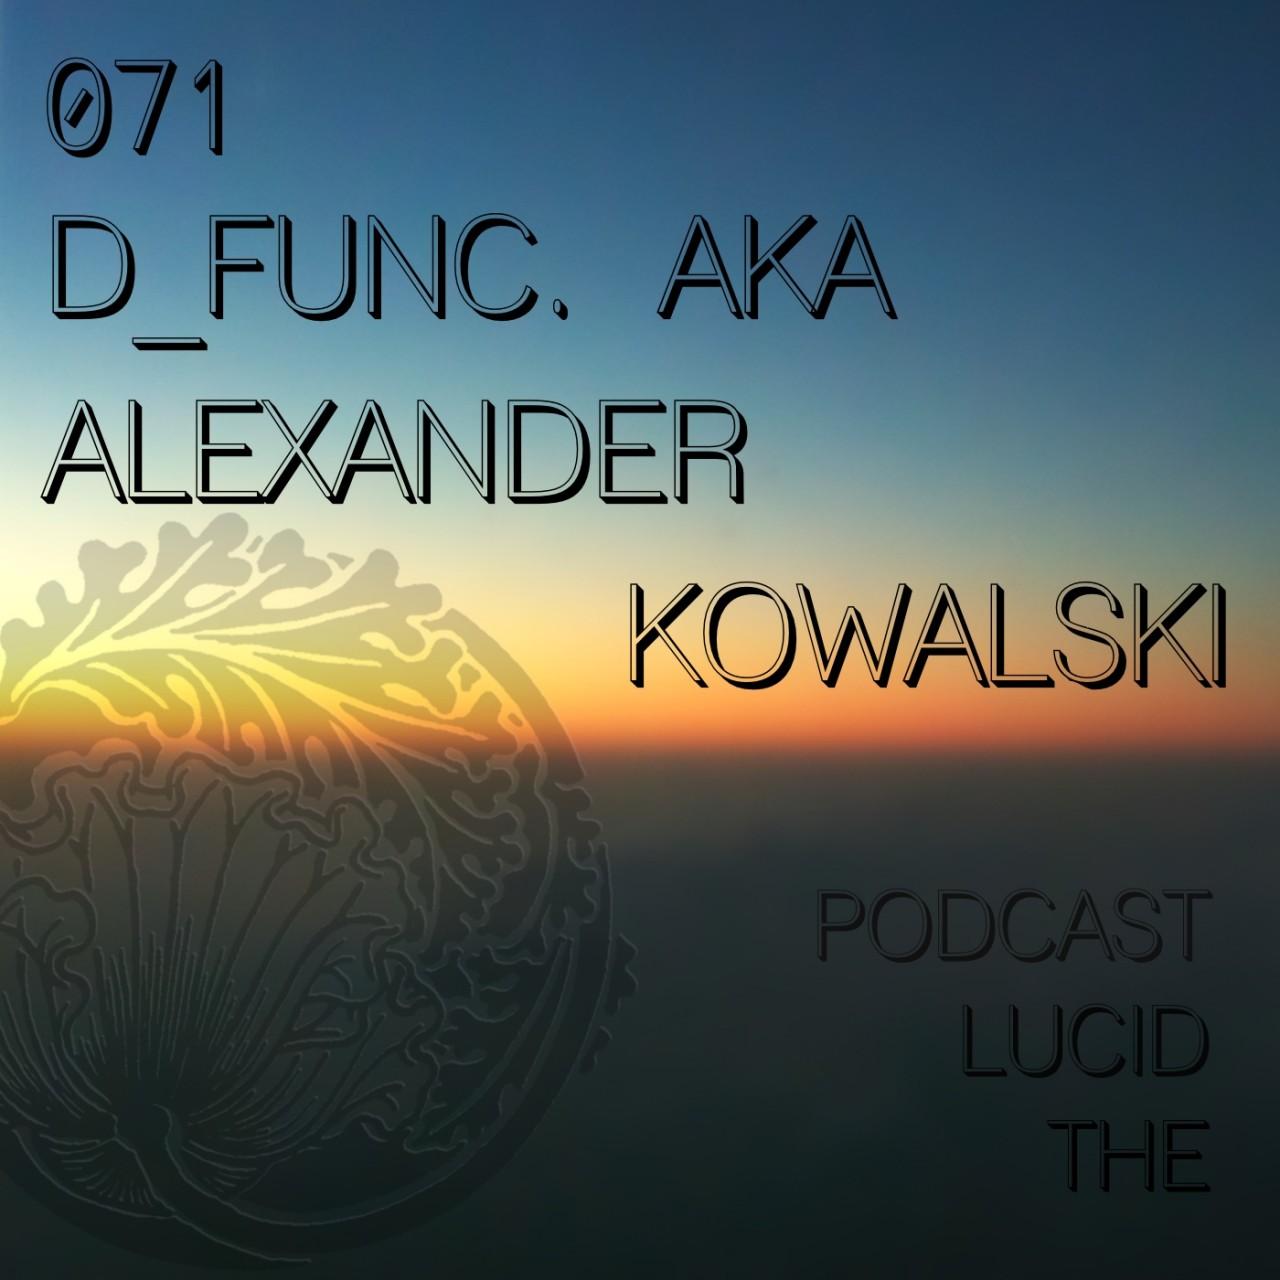 The Lucid Podcast 071 d_func. aka Alexander Kowalski